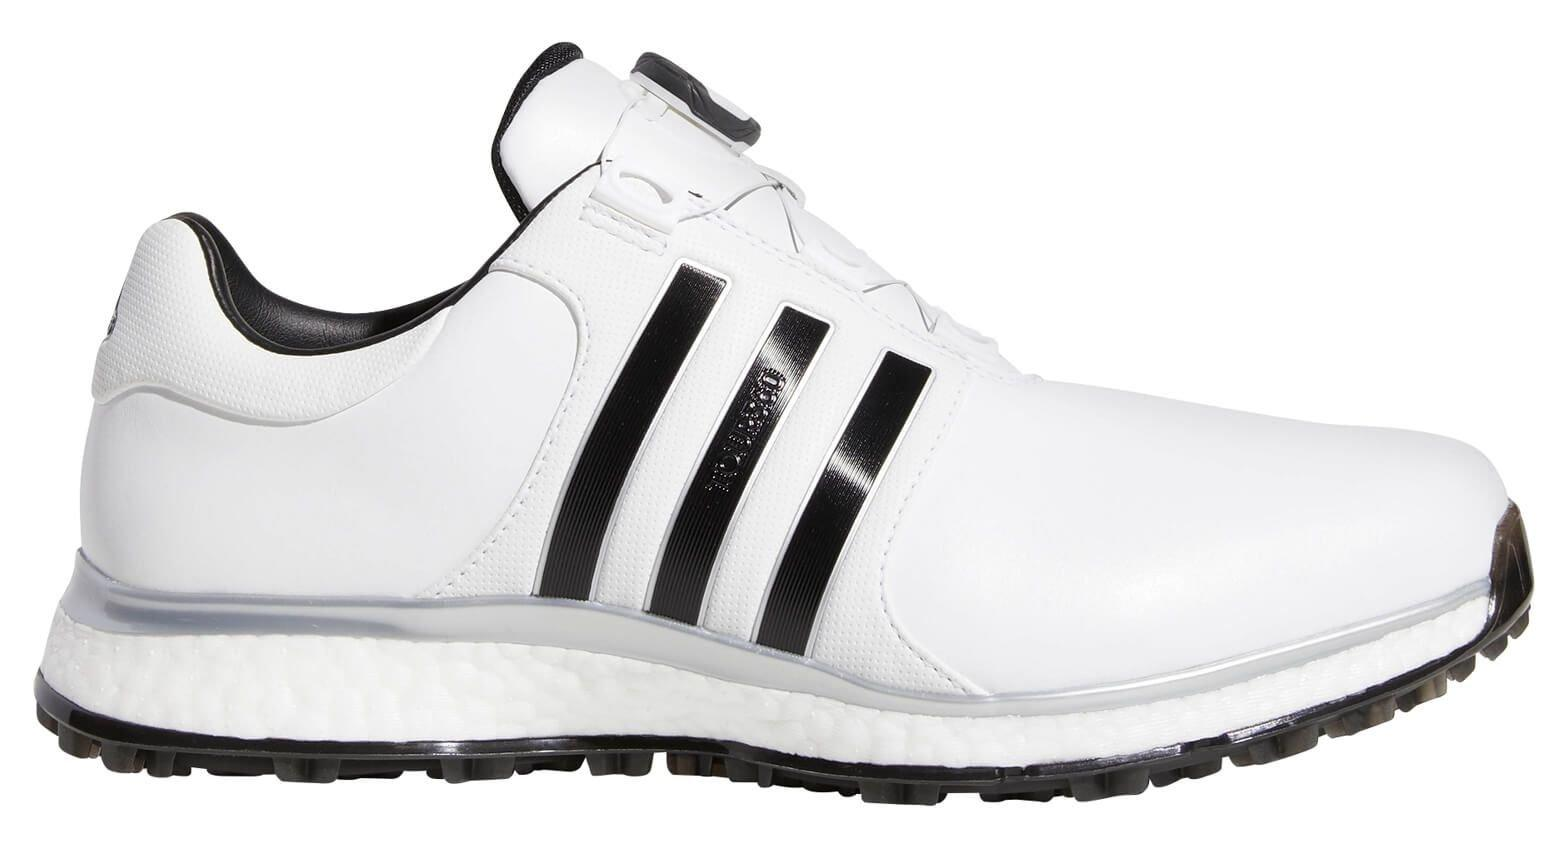 Cuervo Óptima orientación  Adidas Tour 360 XT Spikeless BOA Golf Shoes White/Black/Silver - Carl's  Golfland